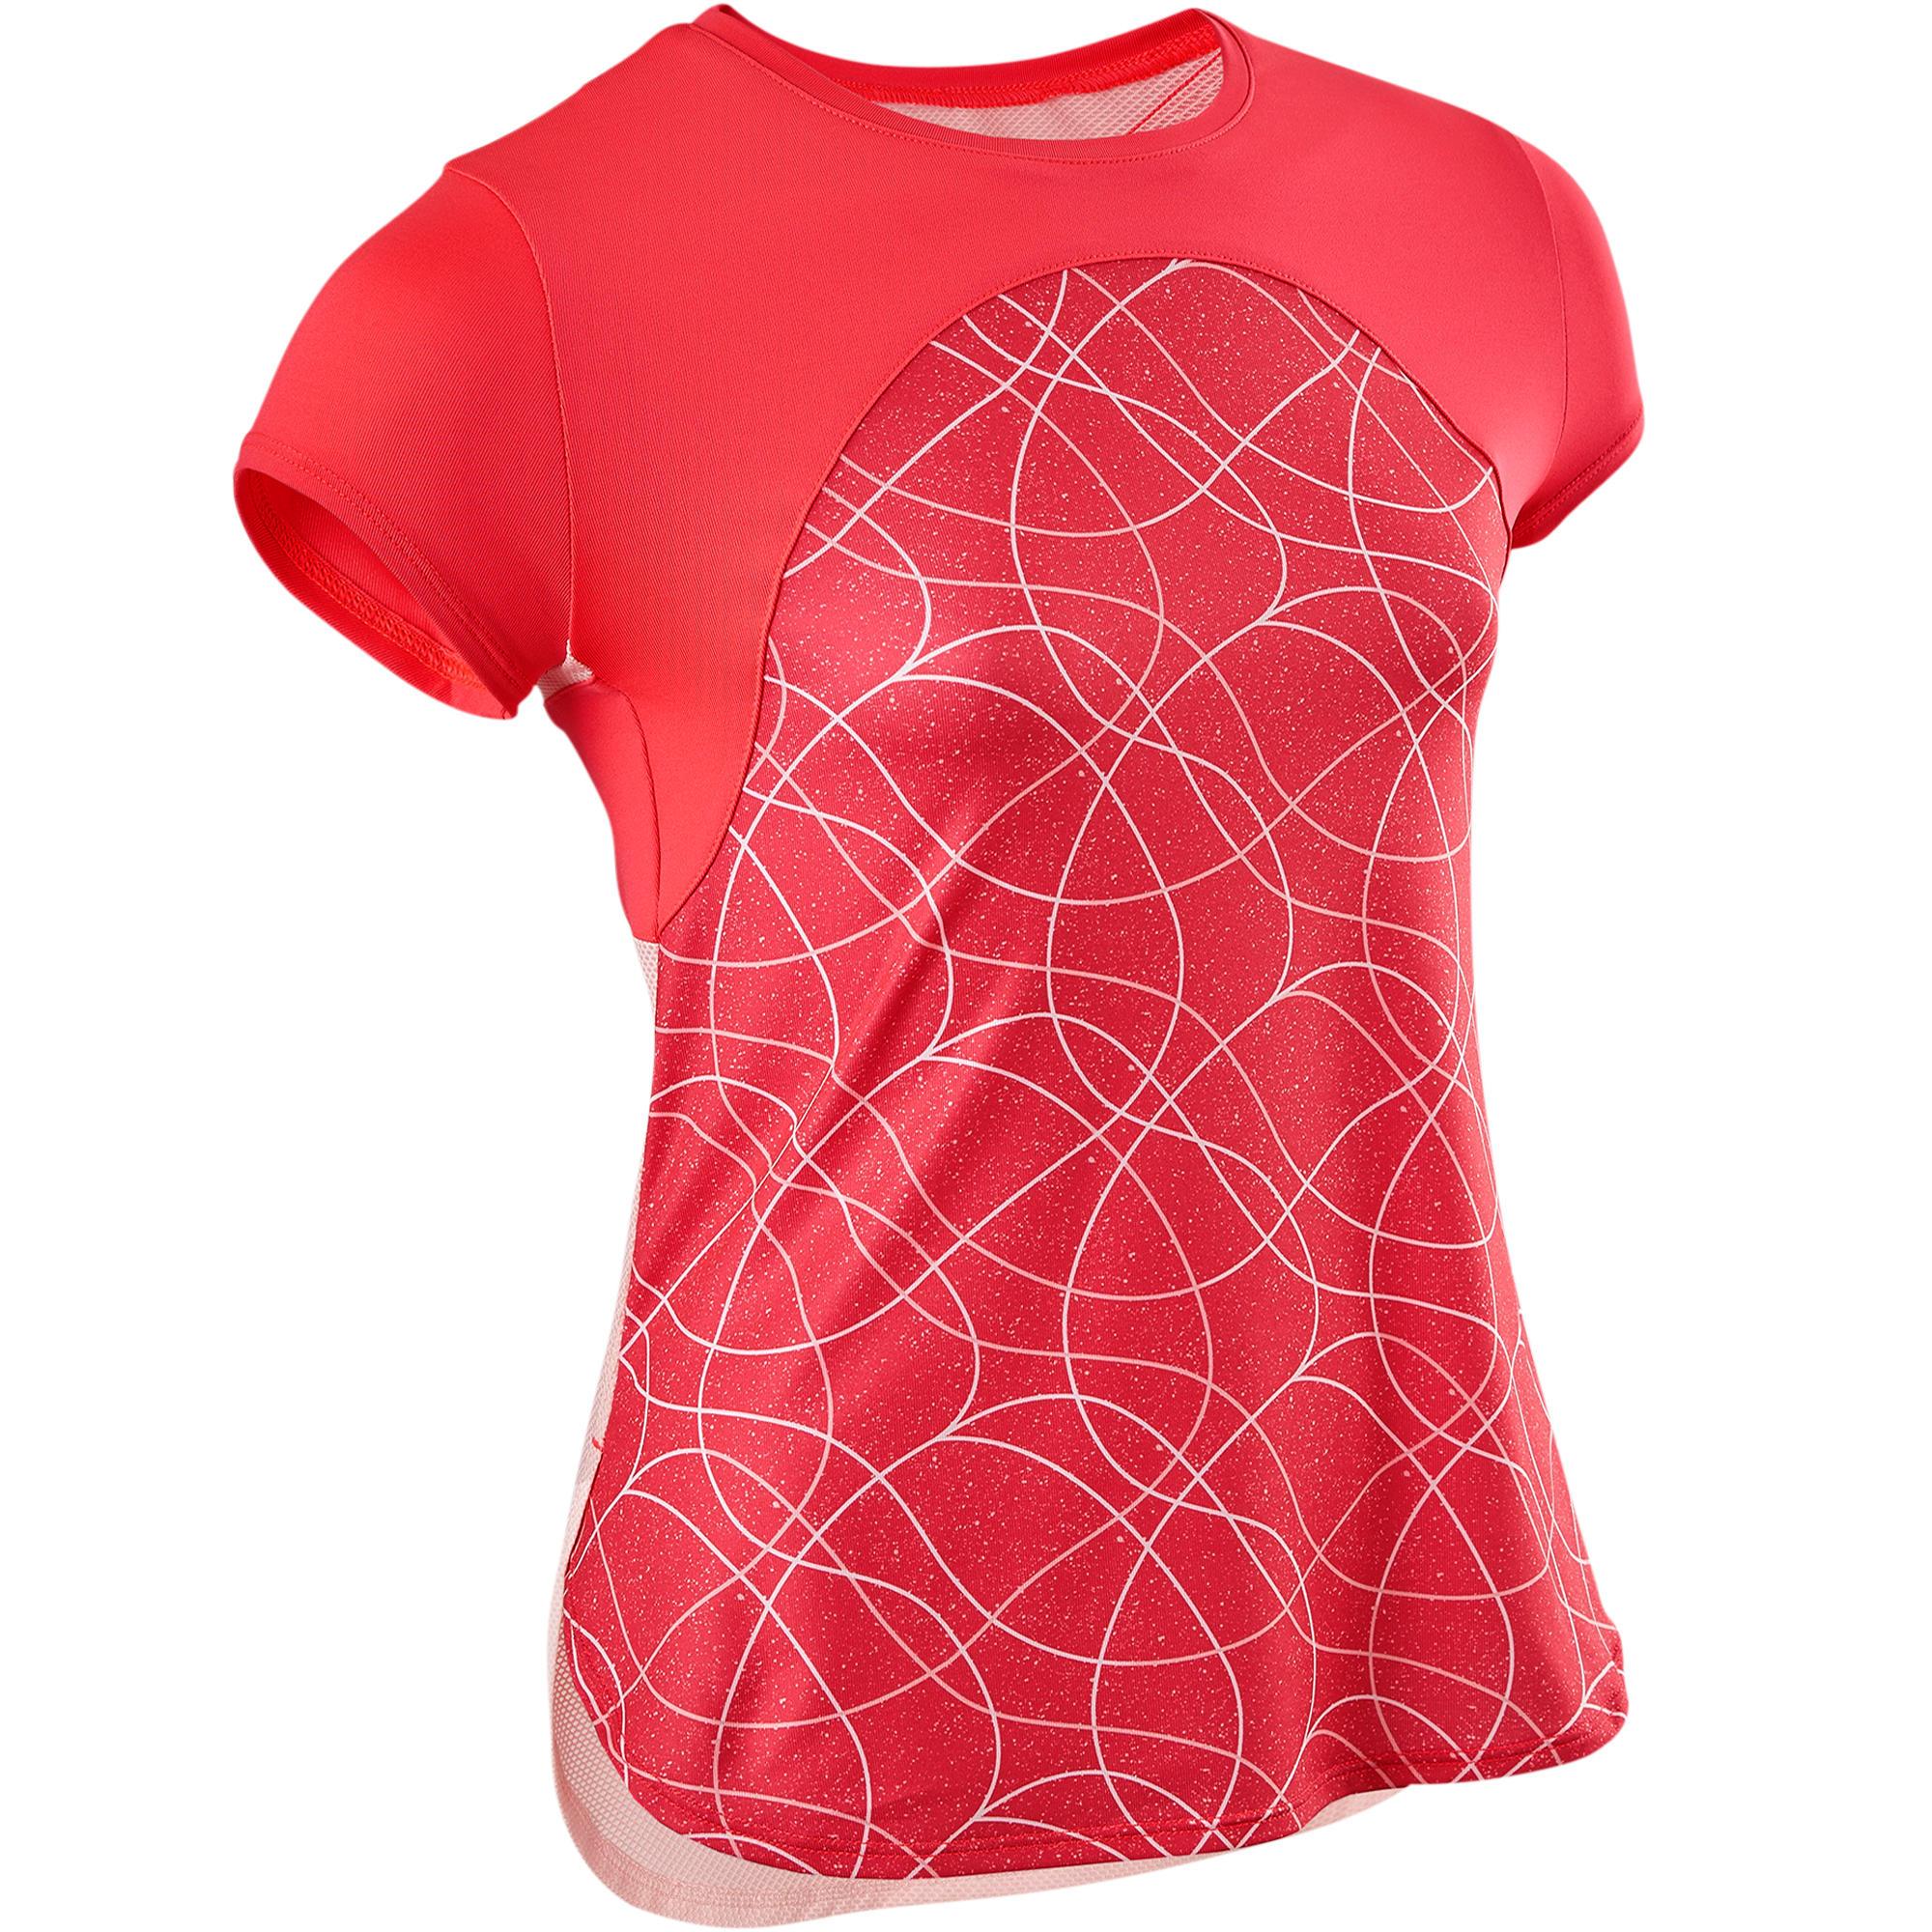 Camiseta De Manga Corta Gimnasia Domyos S900 Transpirable Niña Rojo